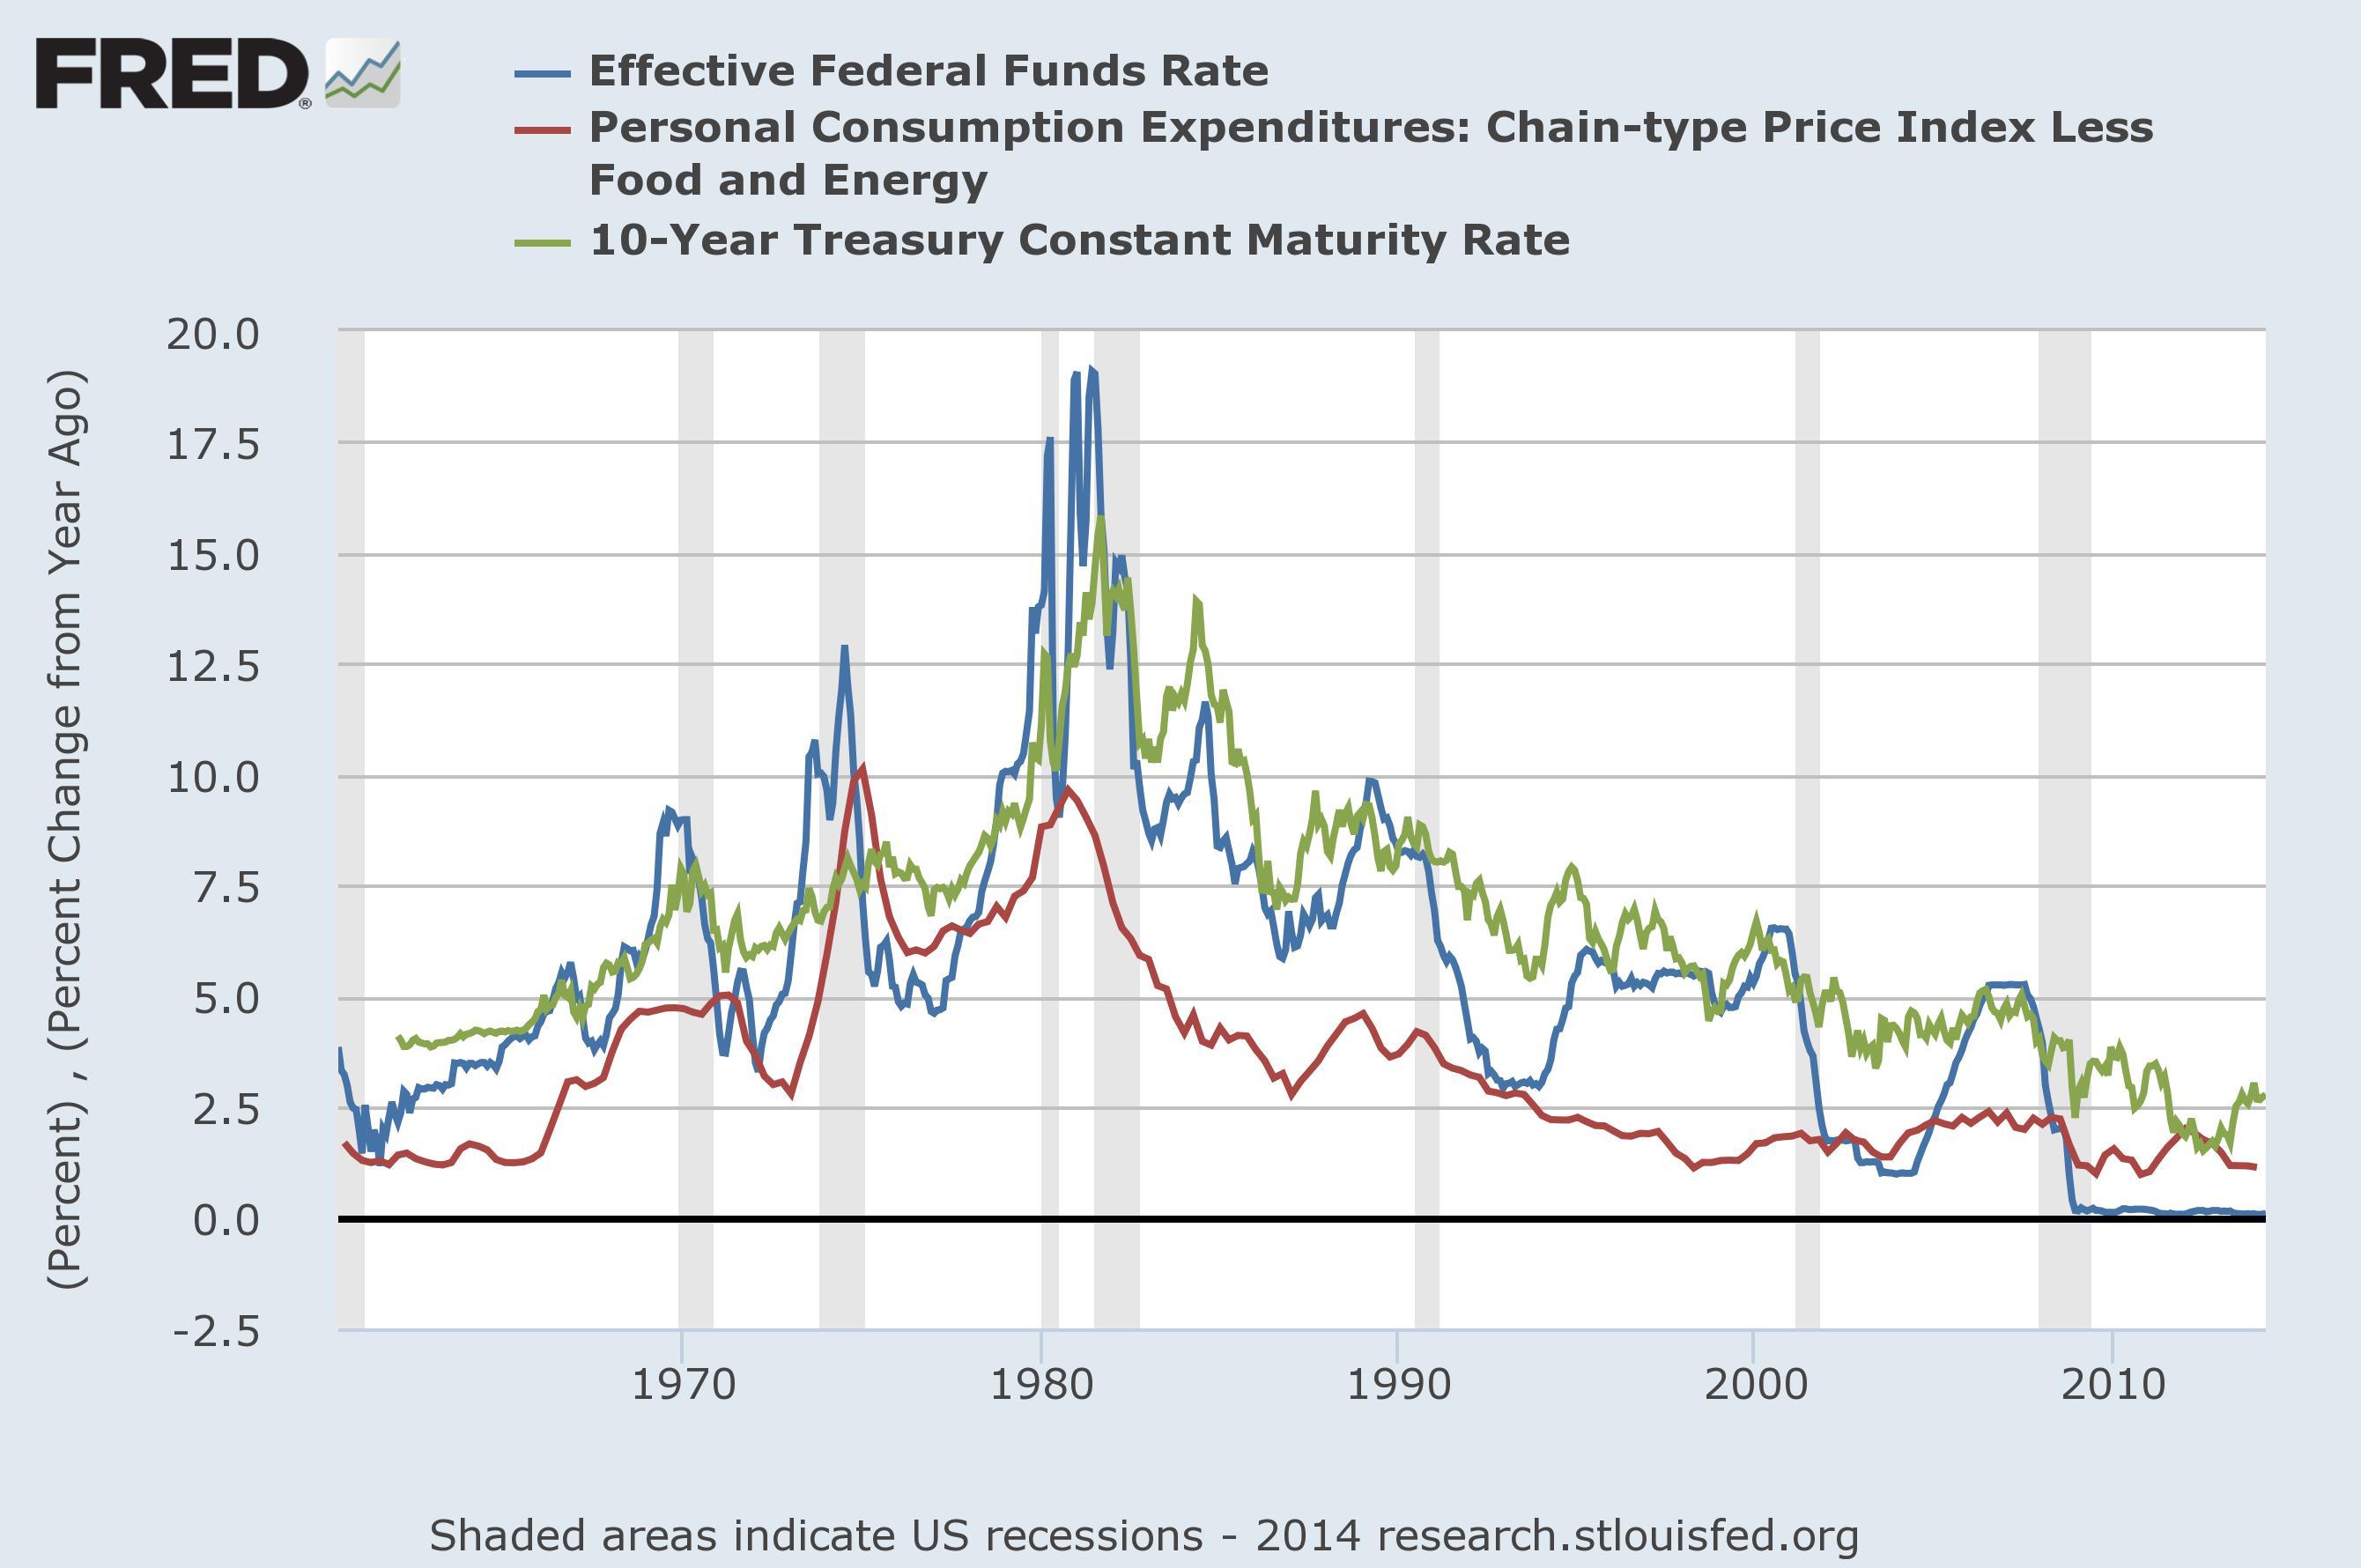 pce-core-yield-fed-funds.jpg